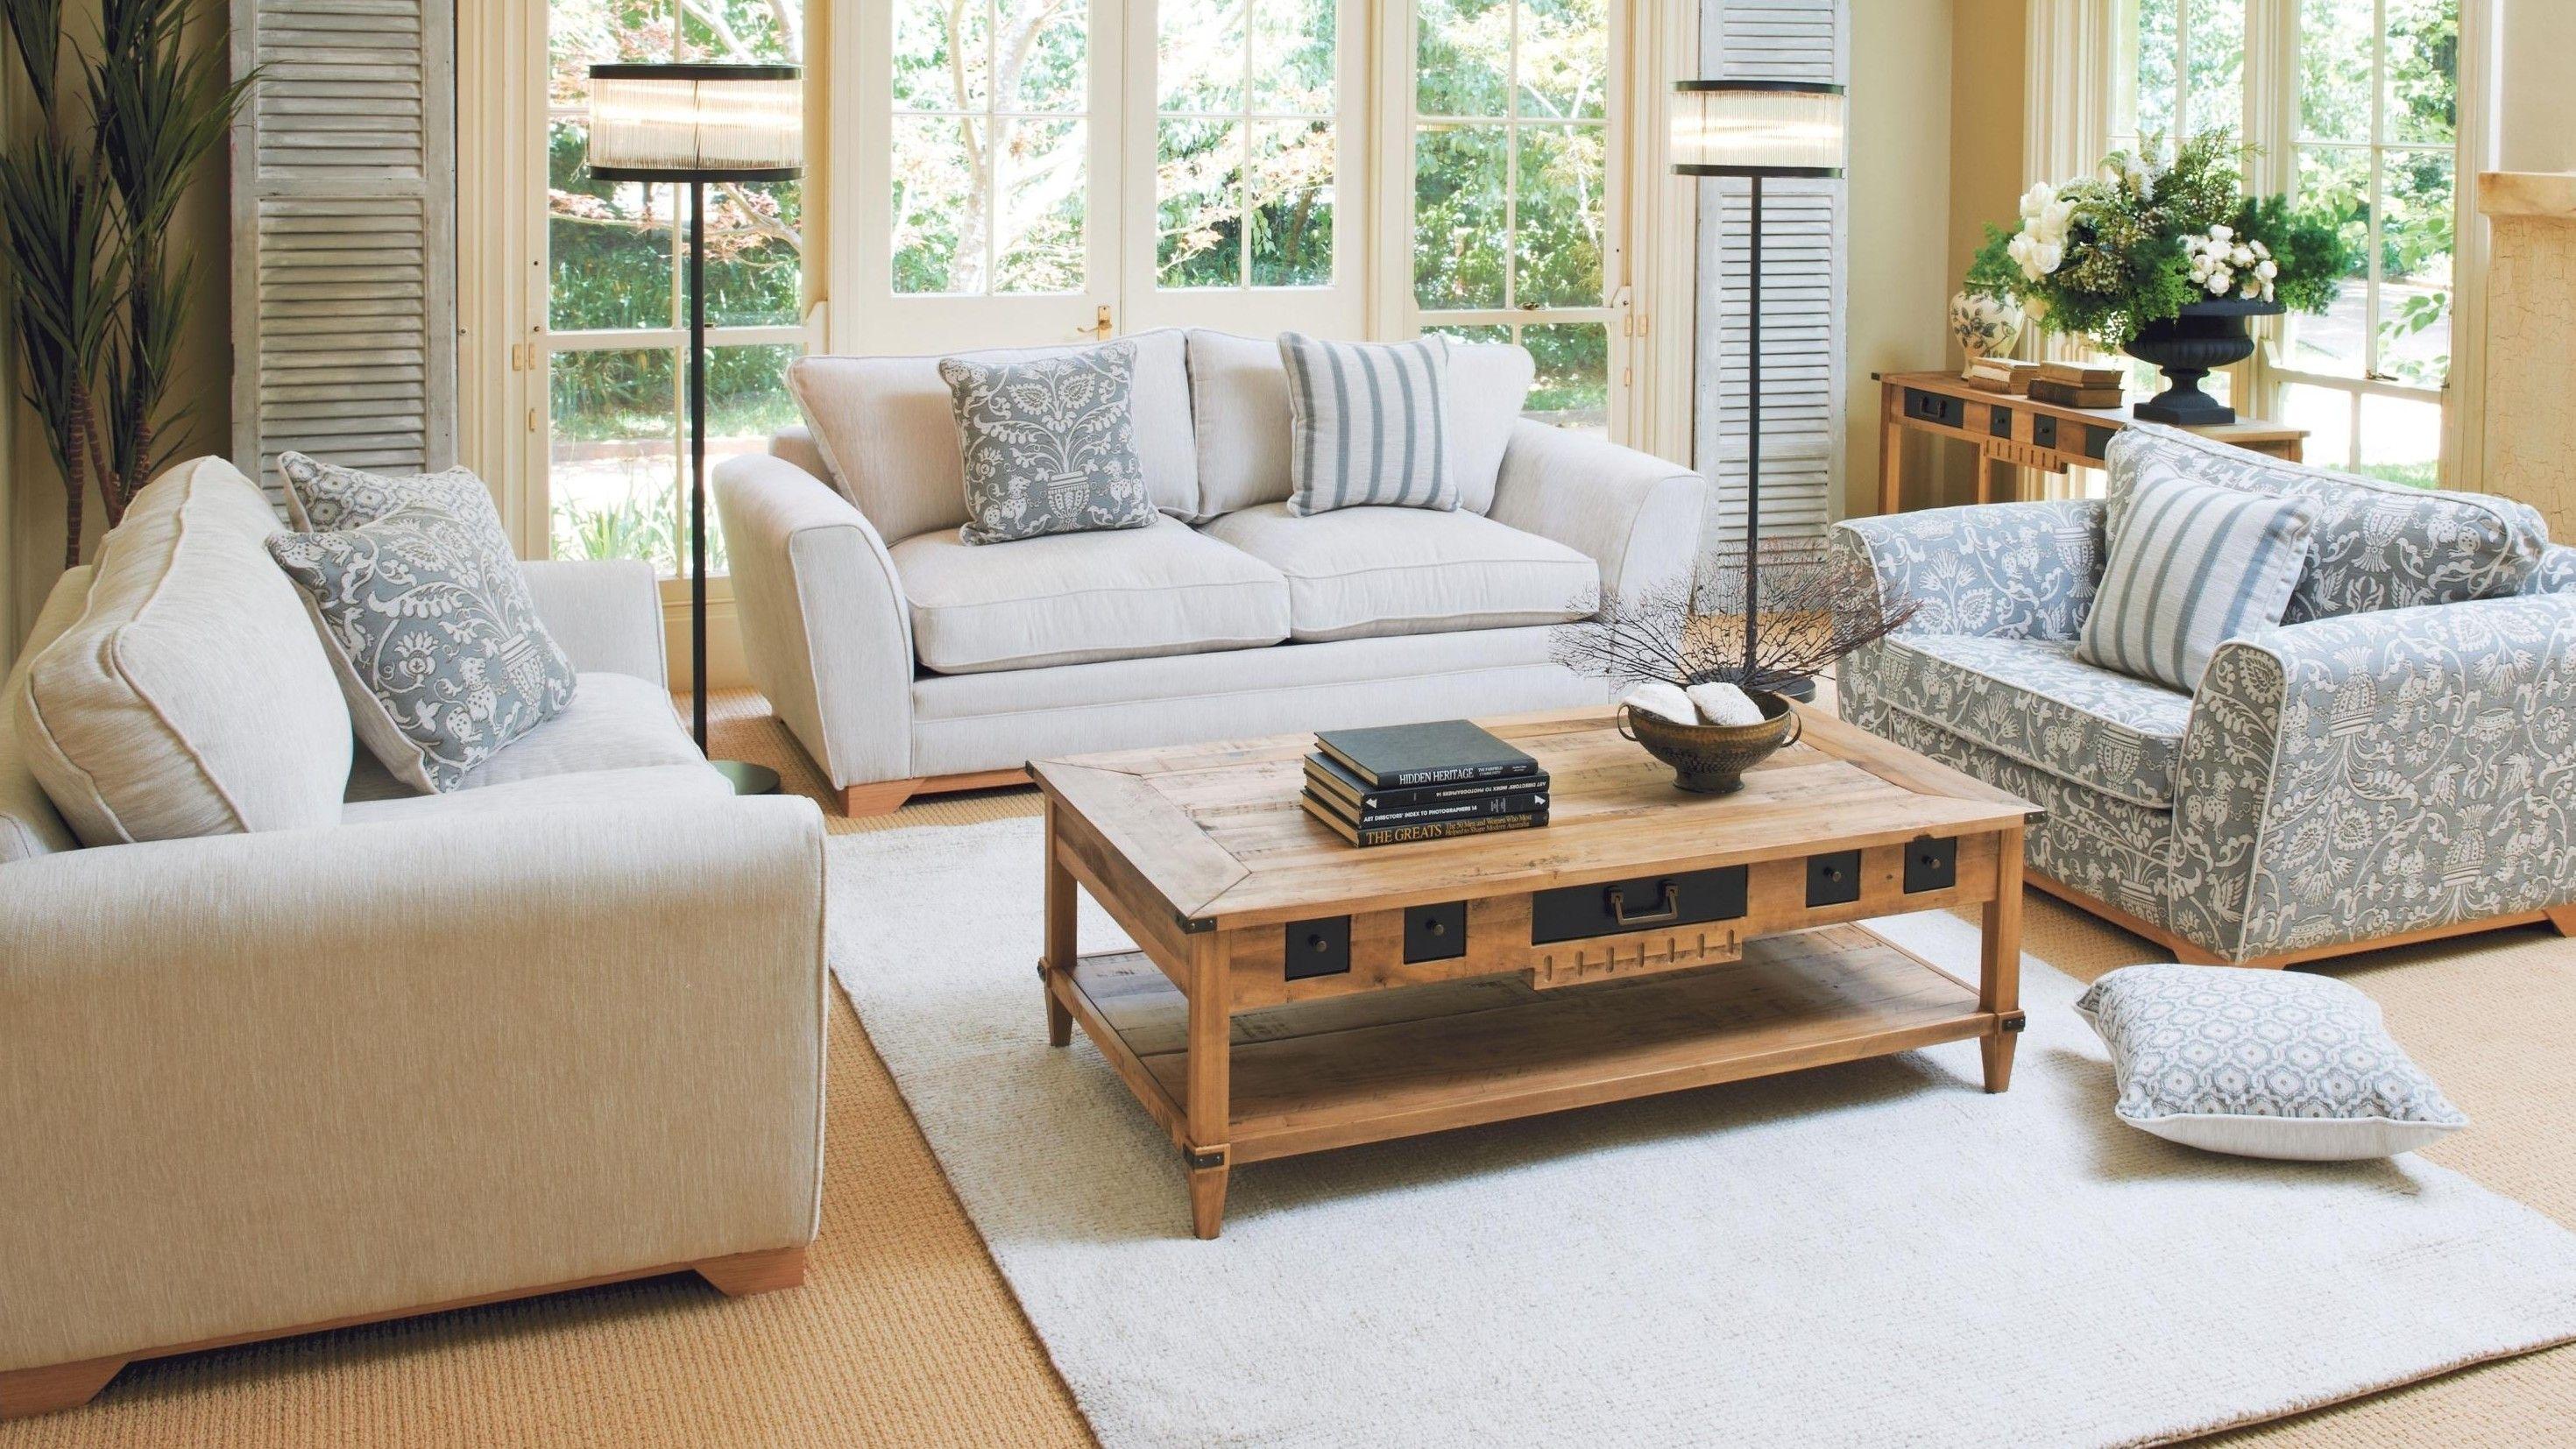 Sloane 2 5 Seater Fabric Sofa Harvey Norman Ideas For